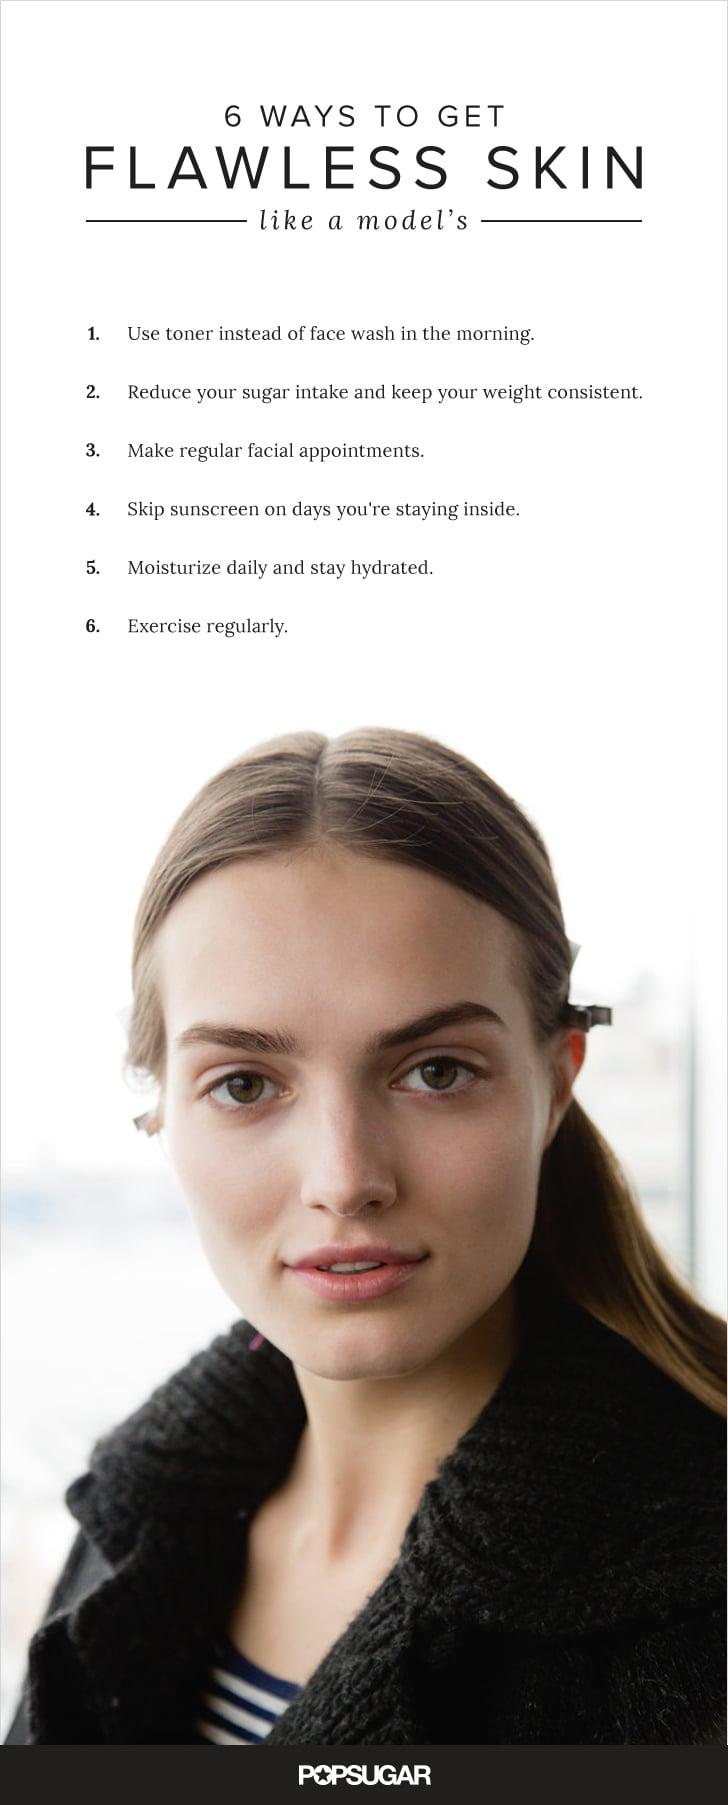 Model Skin Care Tips  POPSUGAR Beauty